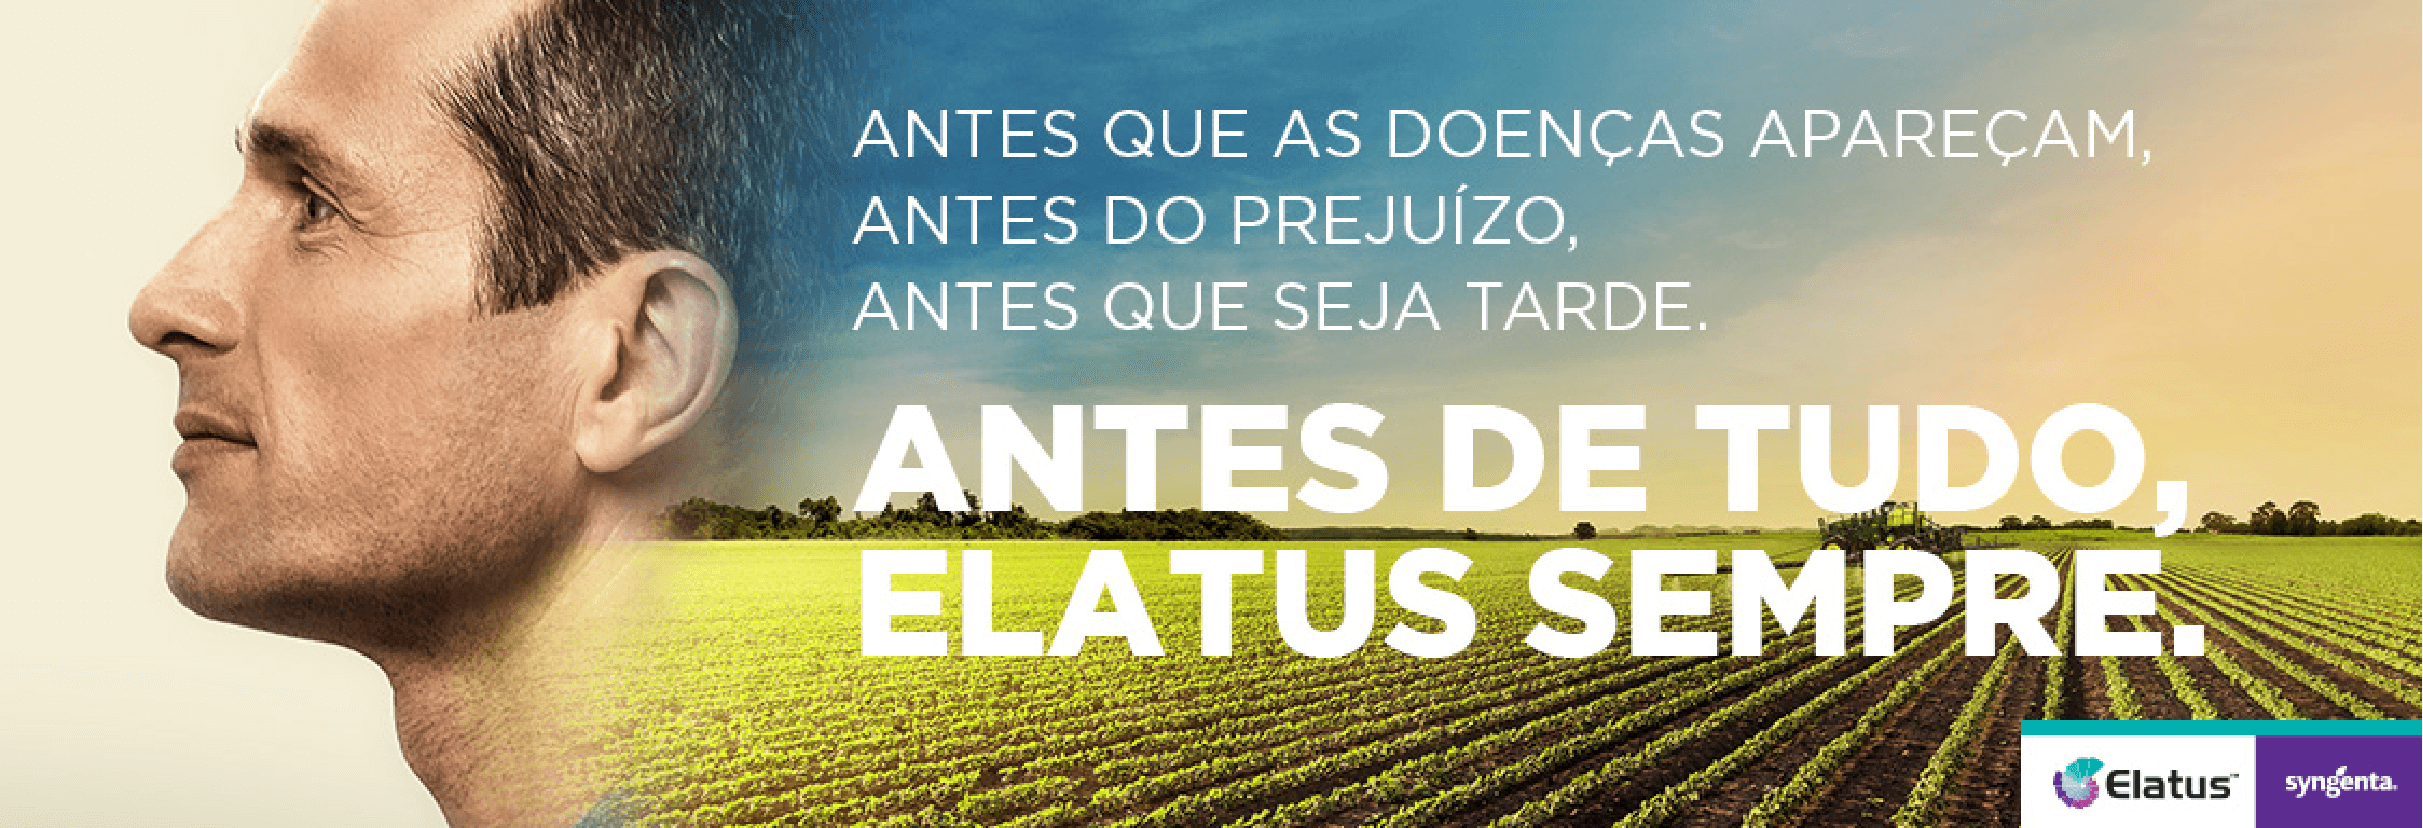 Antes de tudo, Elatus sempre